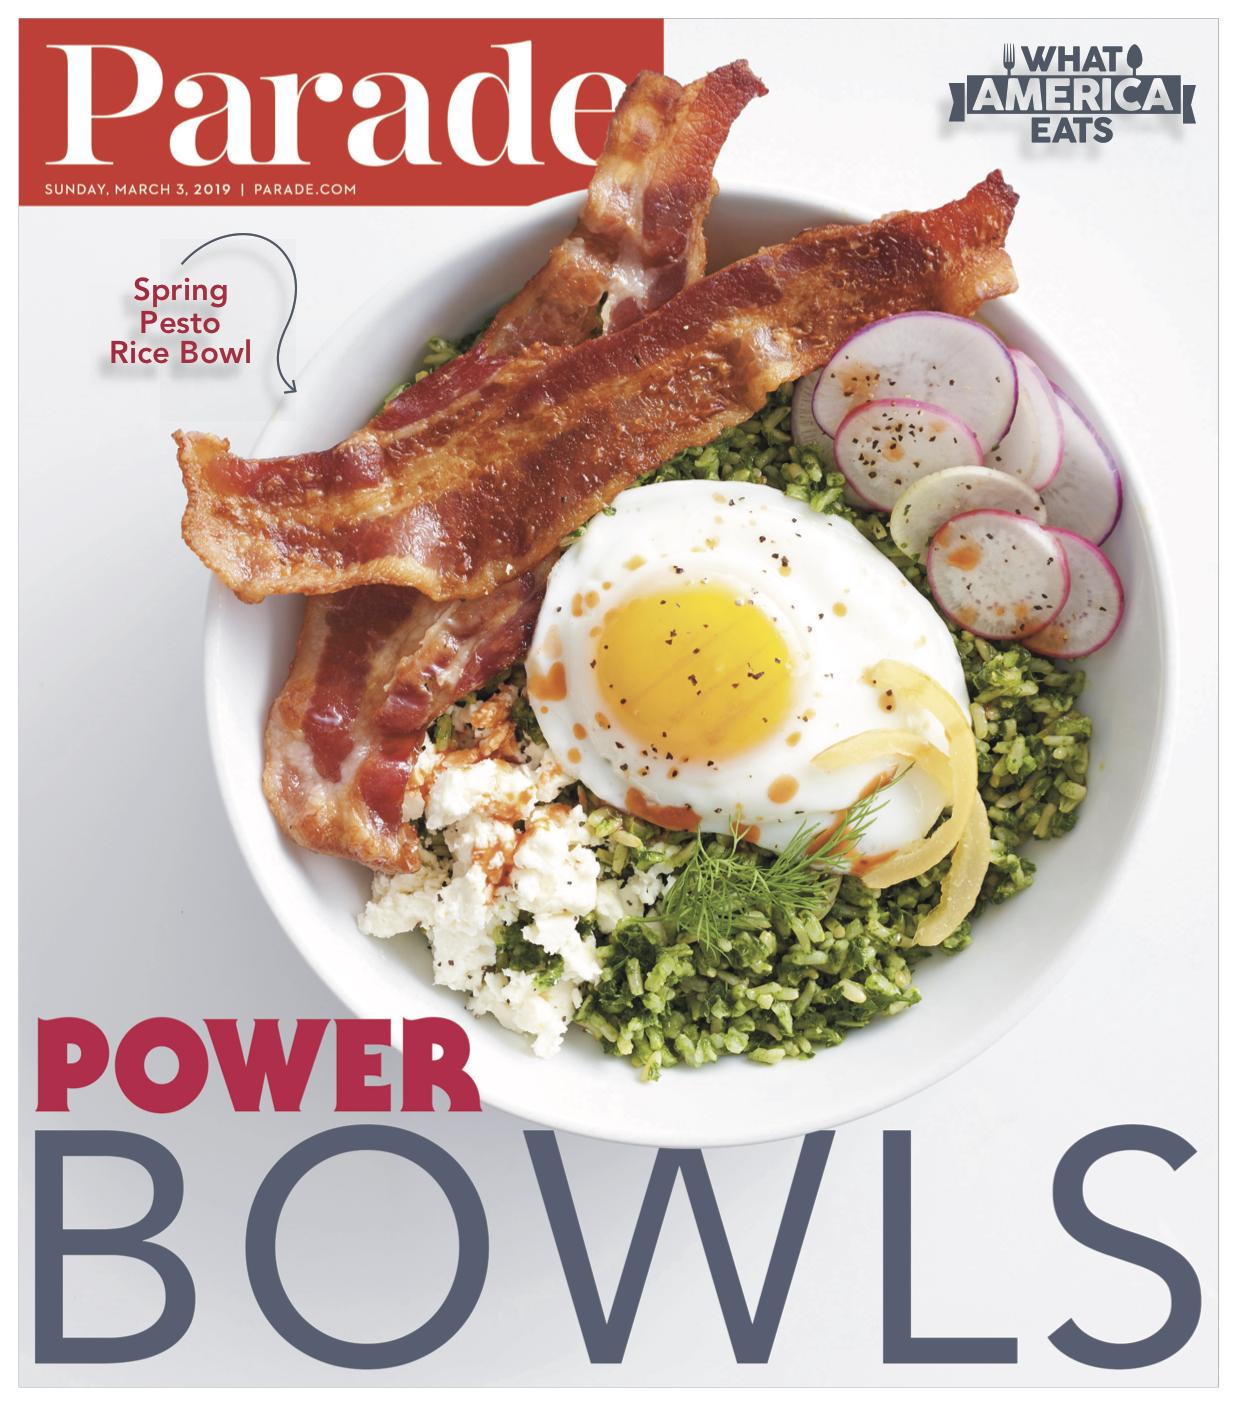 Bowls, Parade 2019